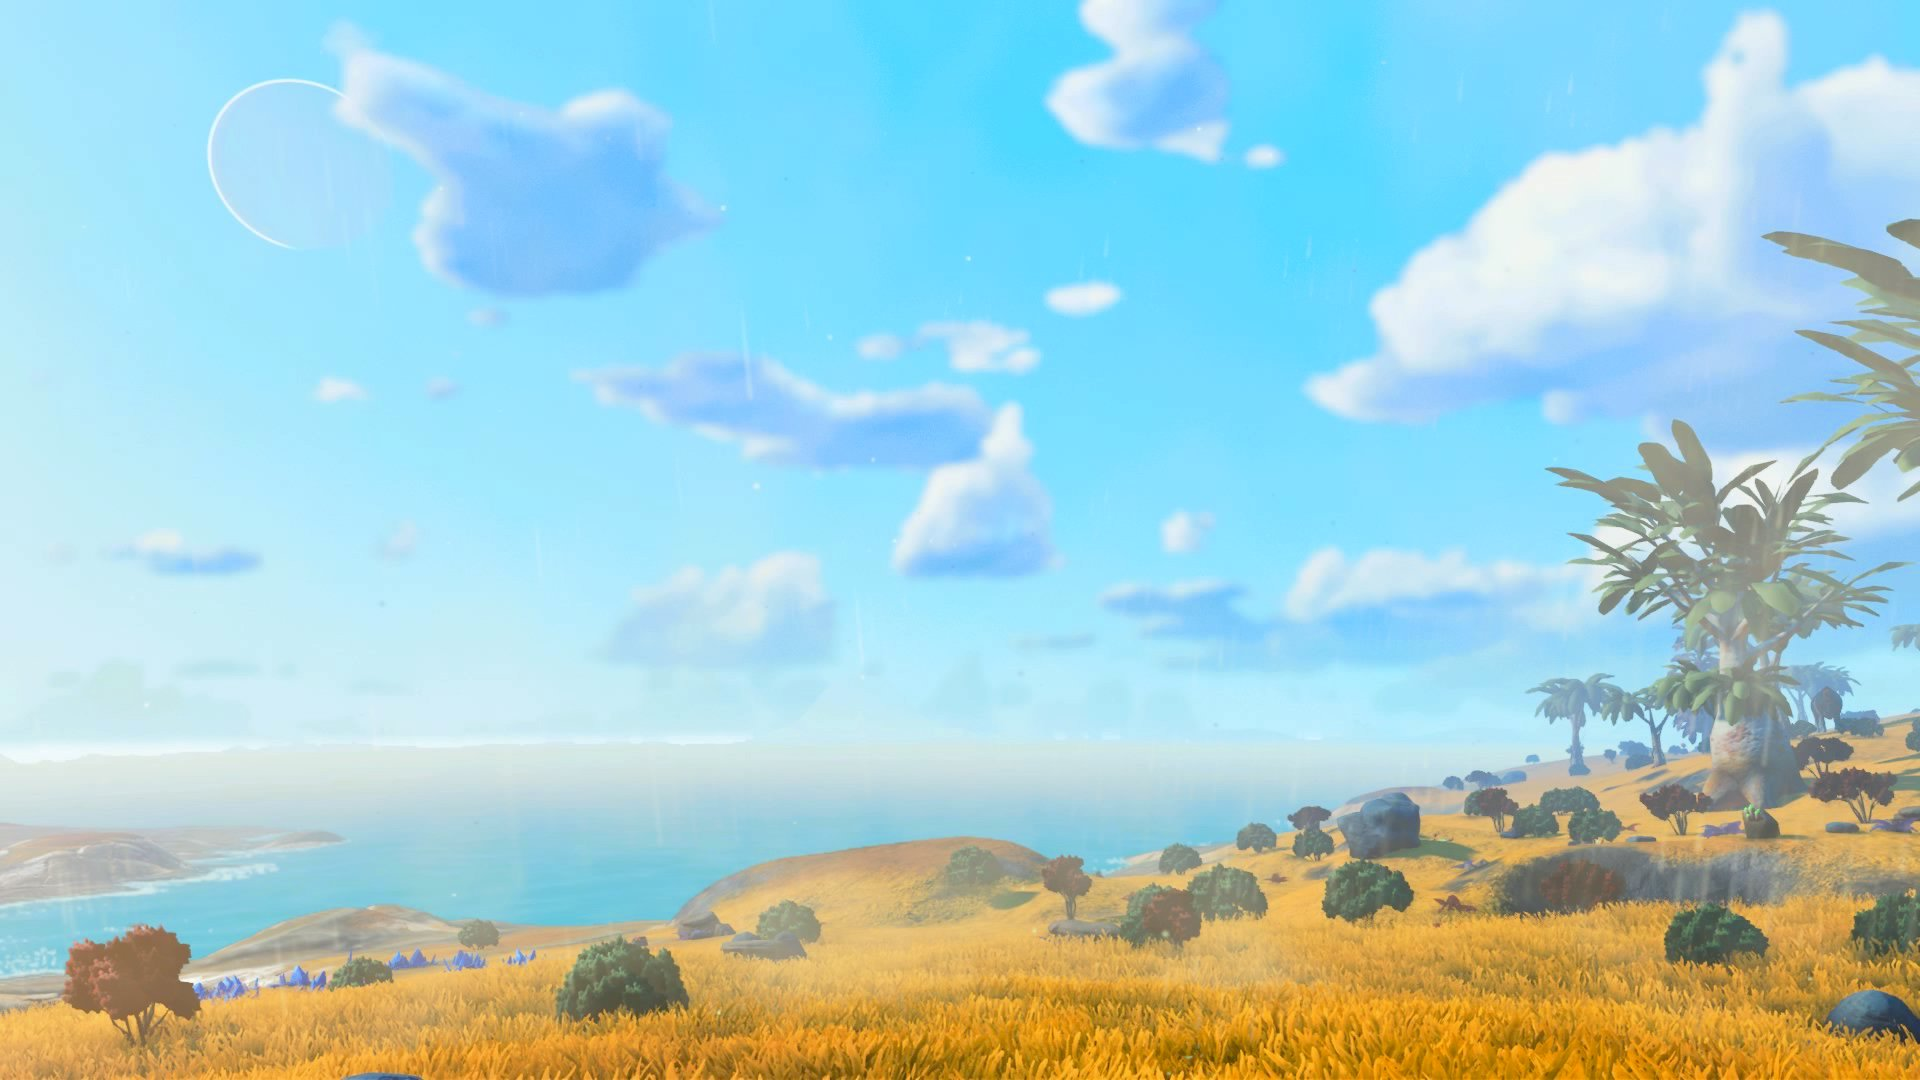 Screenshot from No Man's Sky